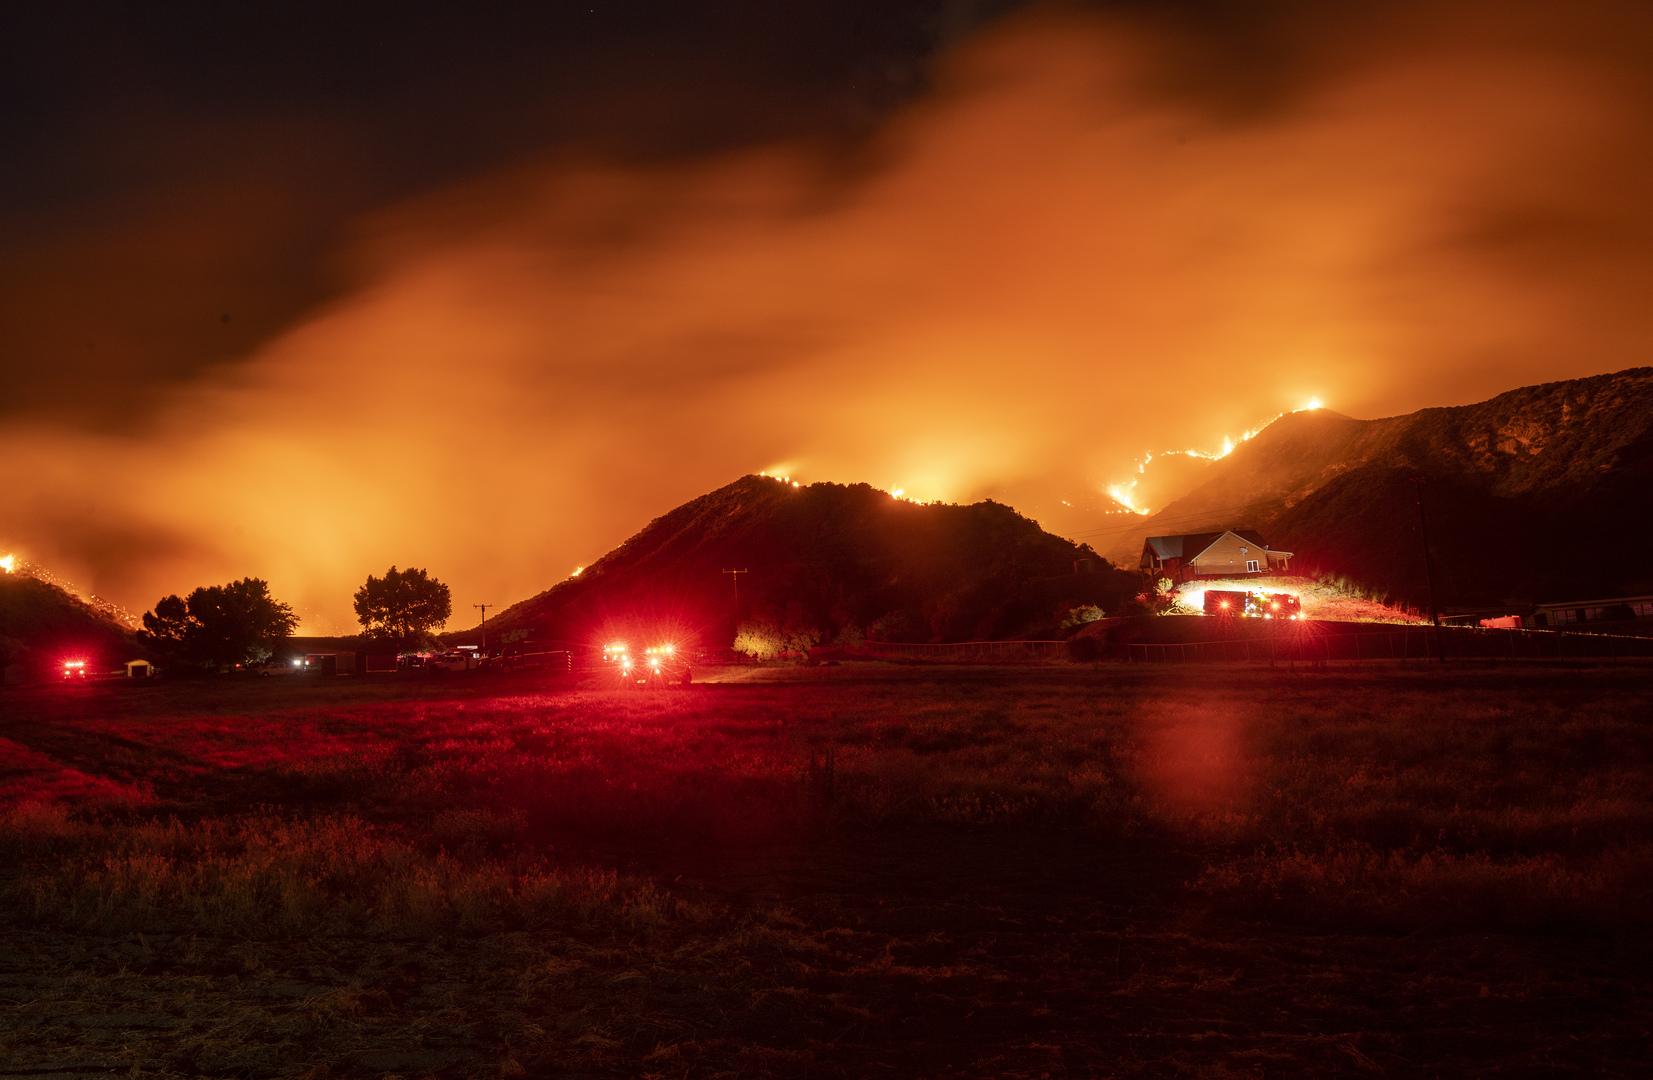 مئات رجال الإطفاء يكافحون حريقا هائلا شرقي لوس أنجلوس